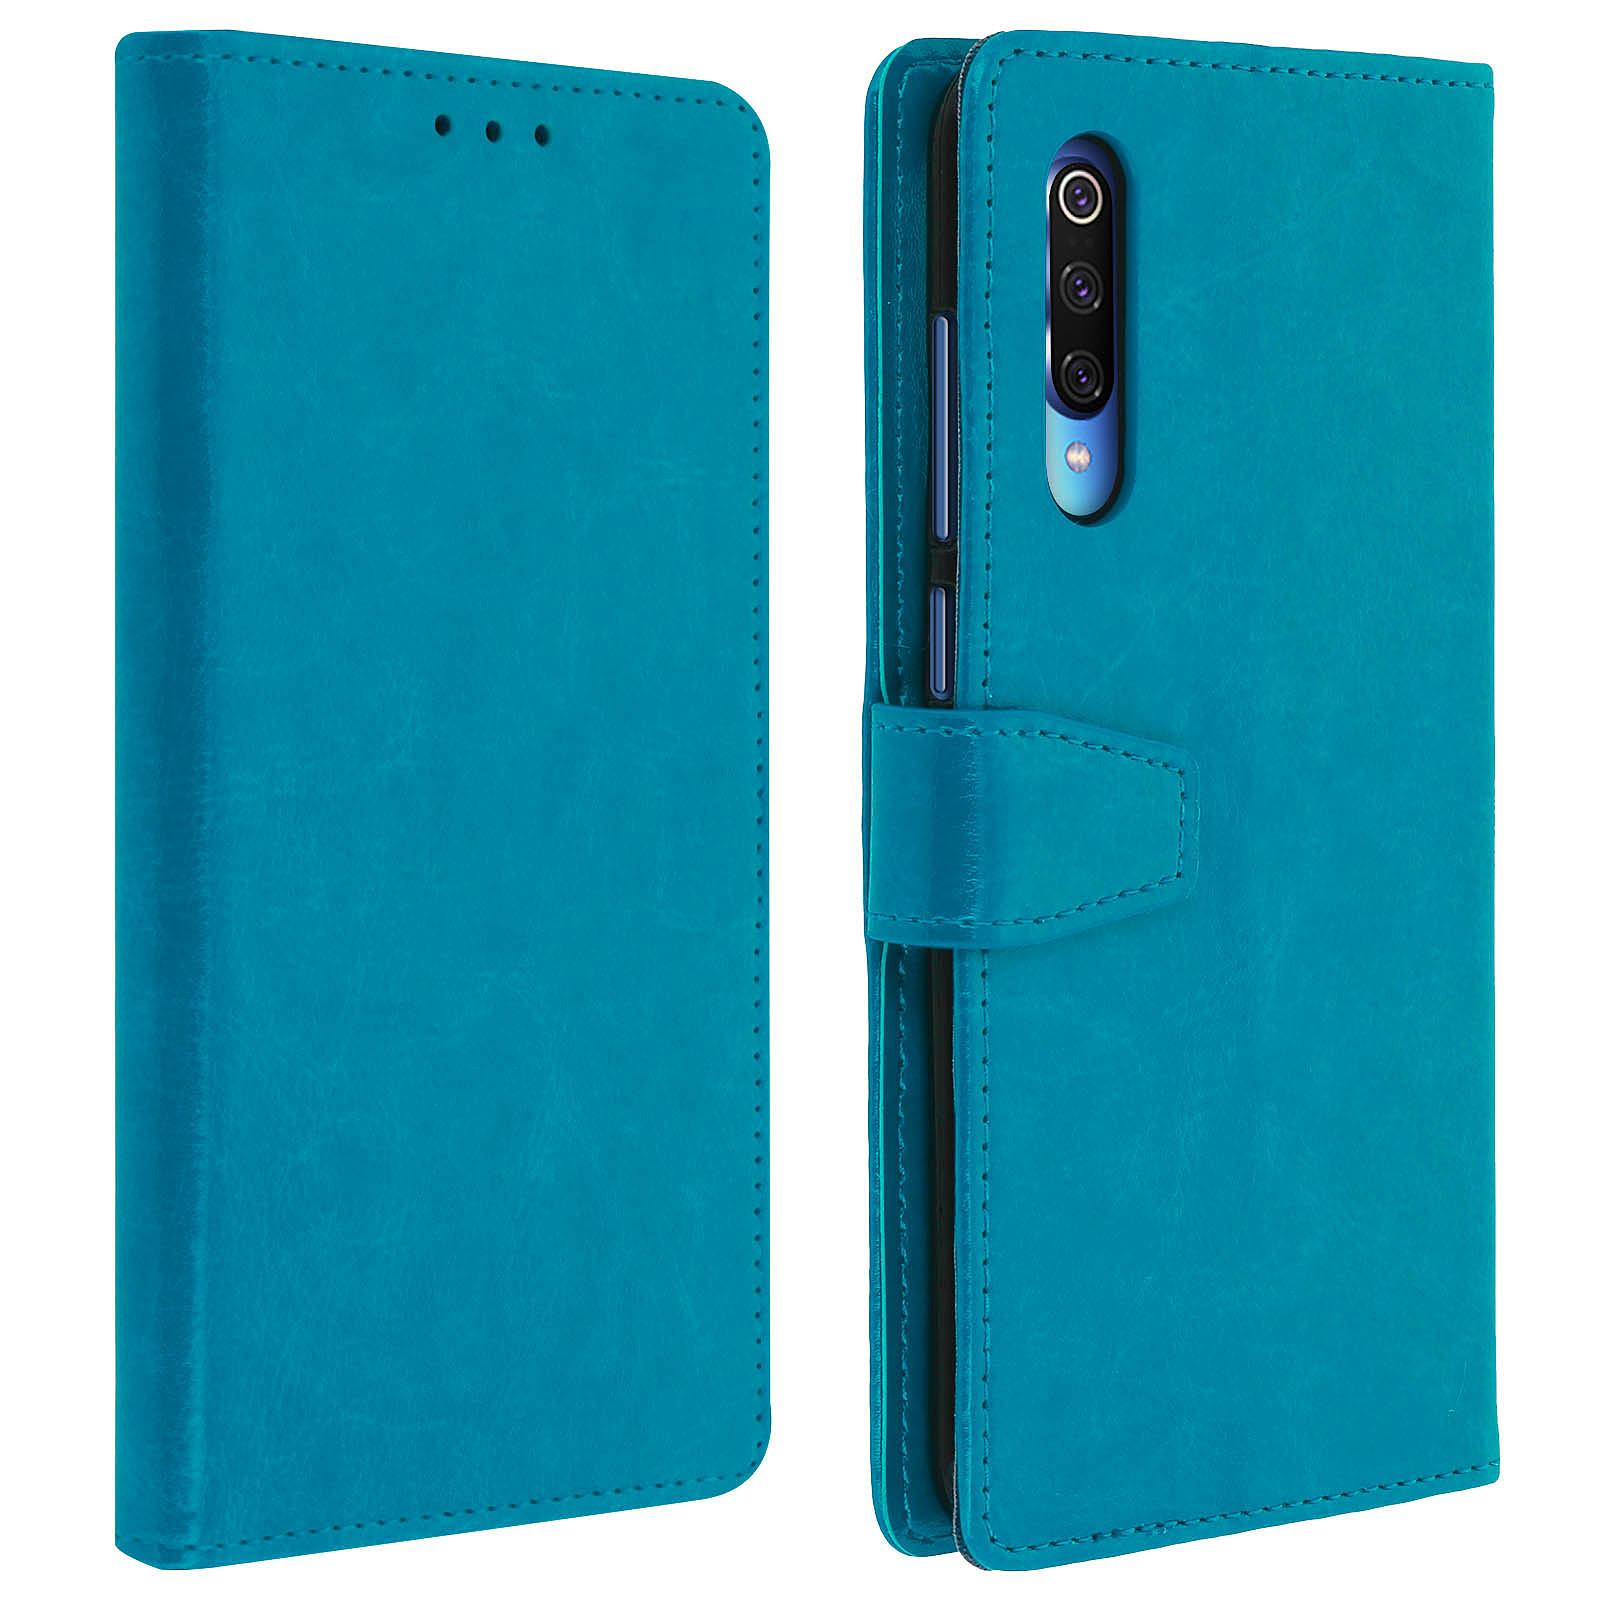 Avizar Etui folio Bleu Nuit pour Xiaomi Mi 9